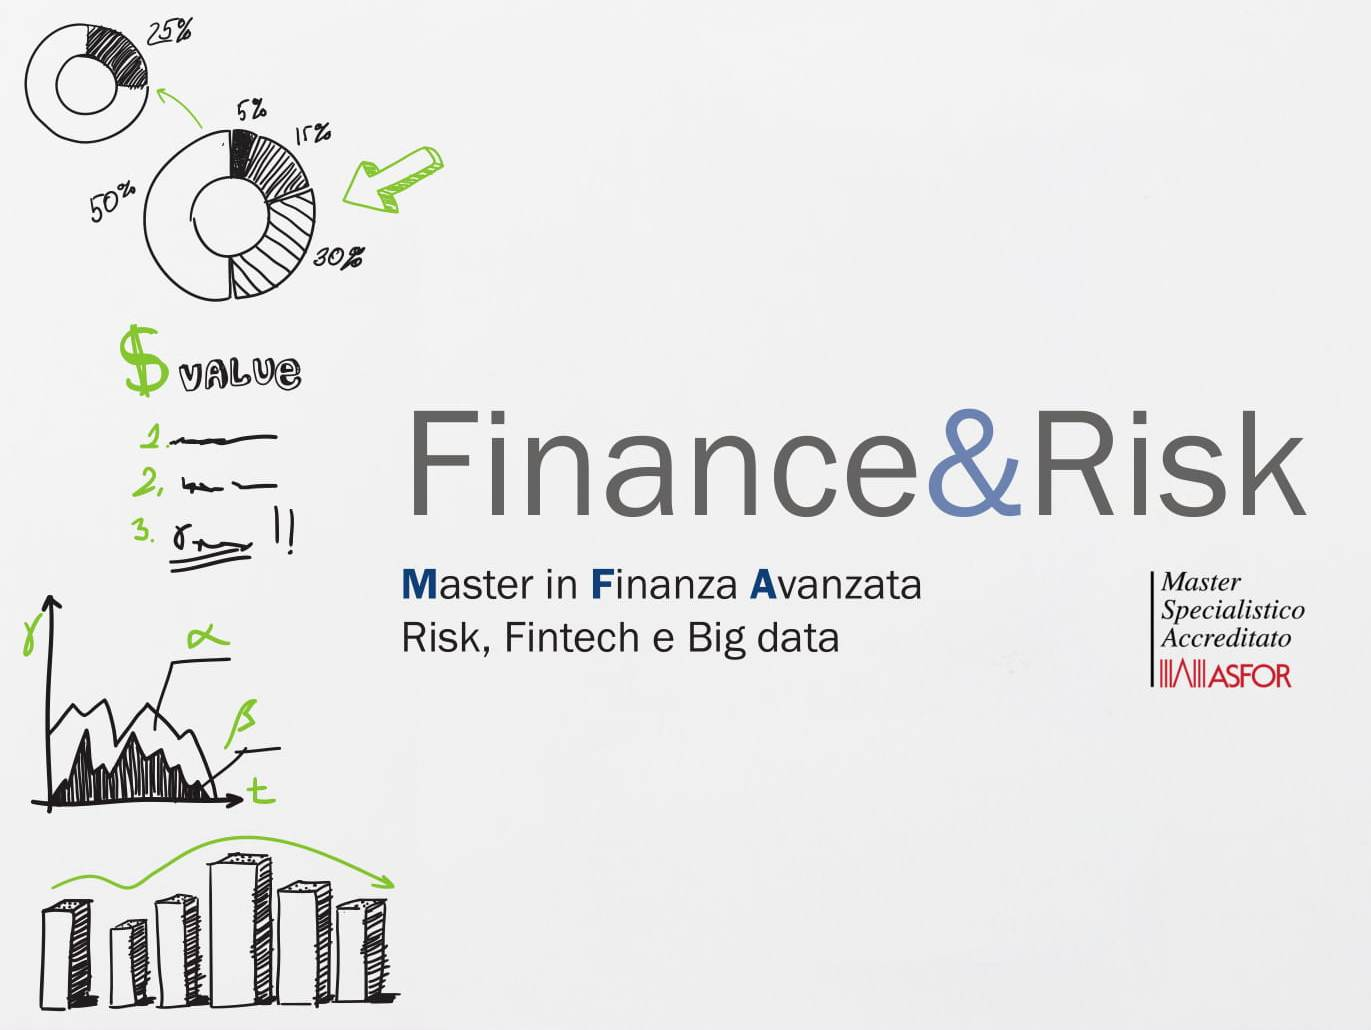 Master in Finanza AvanzataRisk, Fintech e Big data